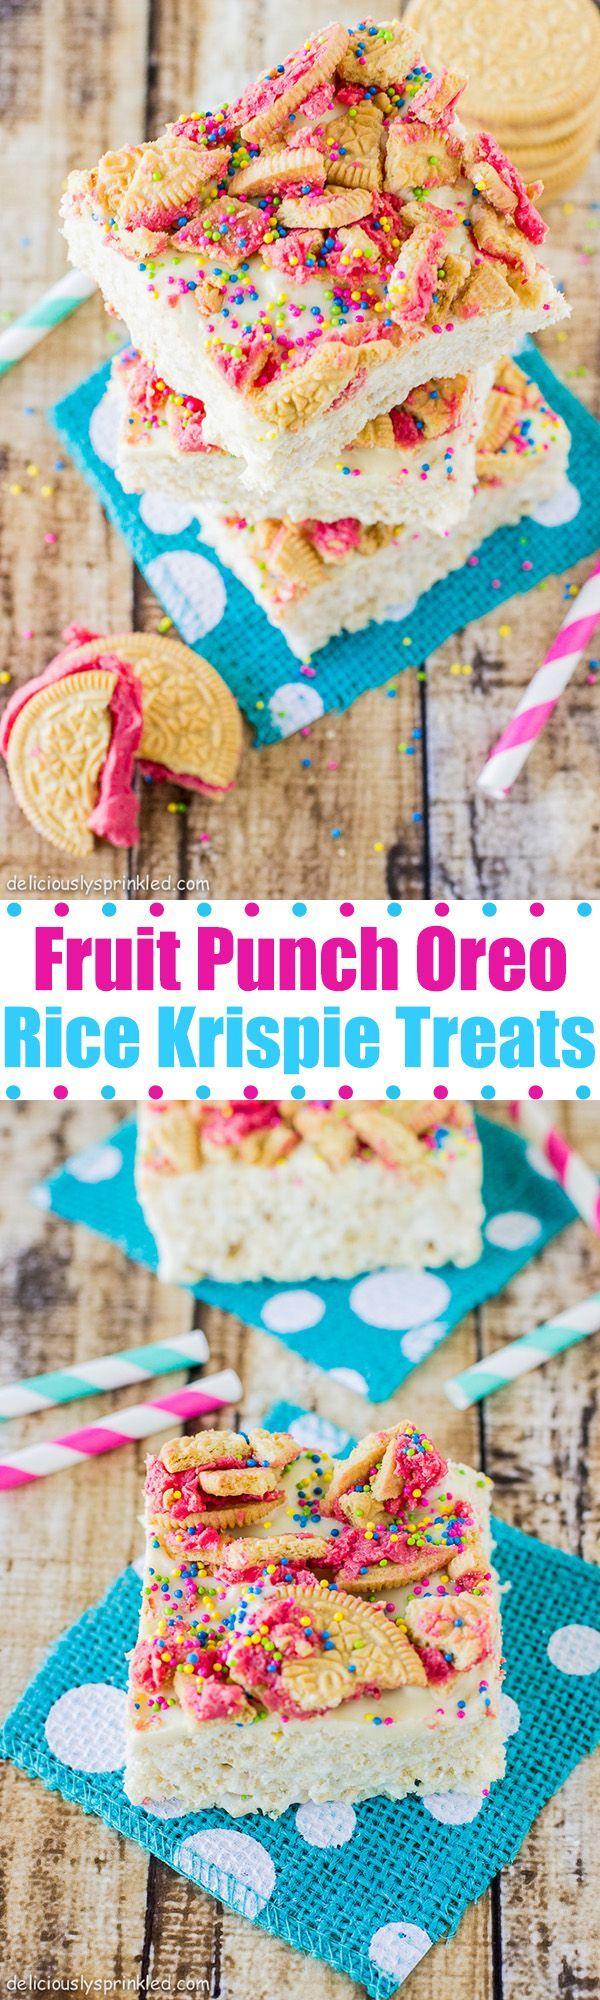 Fruit Punch Oreo Rice Krispie Treats